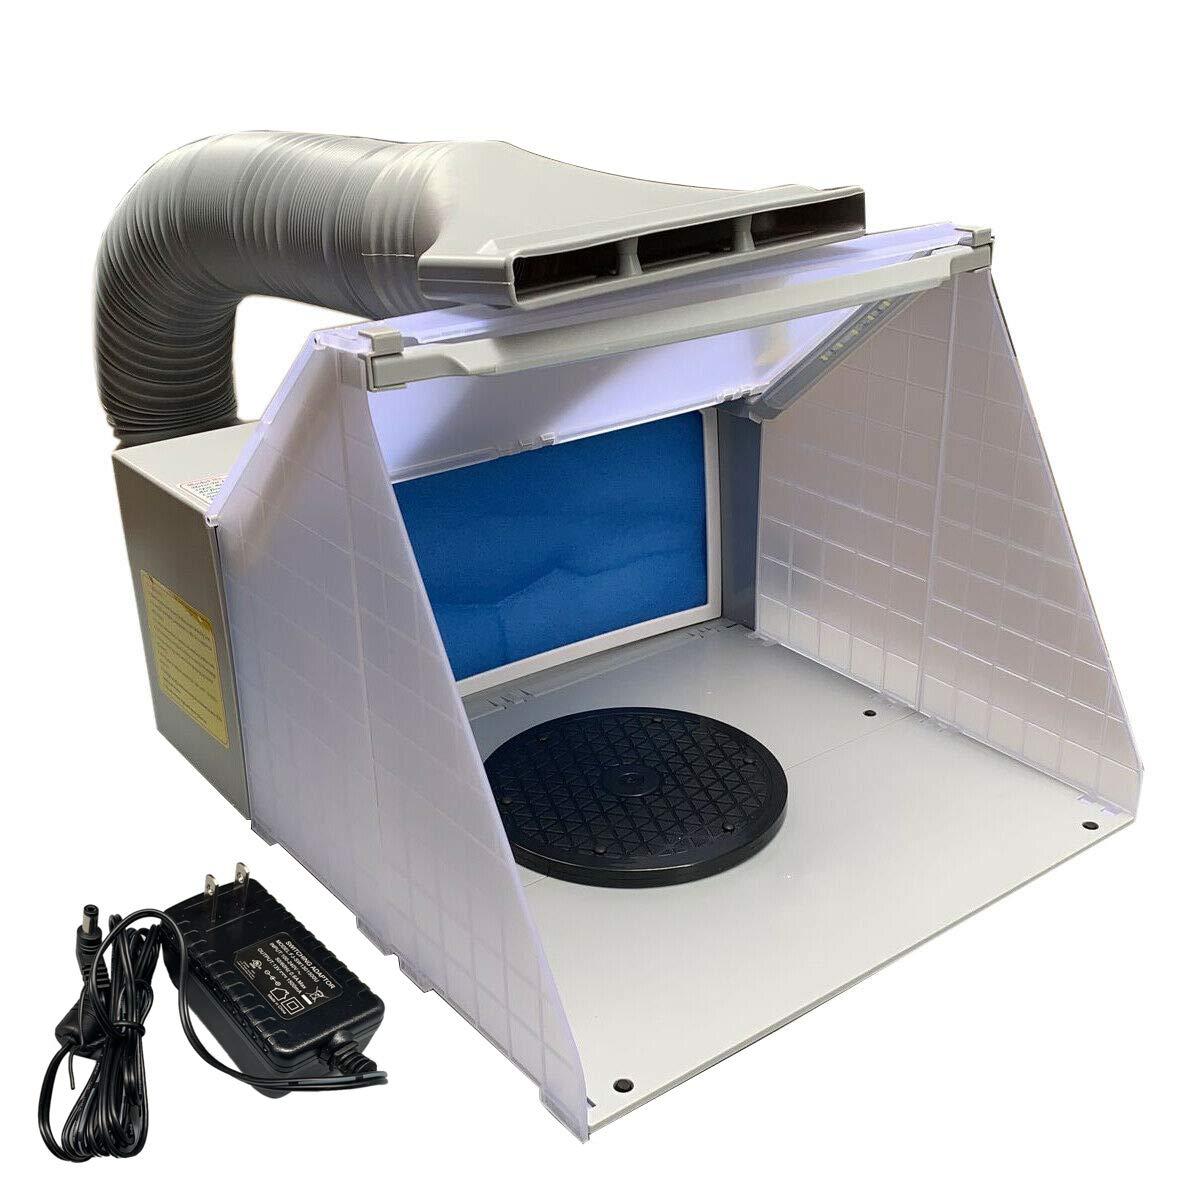 Lfhelper Airbrush Spray Booth Kit W/LED Light Foldable/Portable for Cake/Craft/Hobby/Nail DIY Painting by Lfhelper